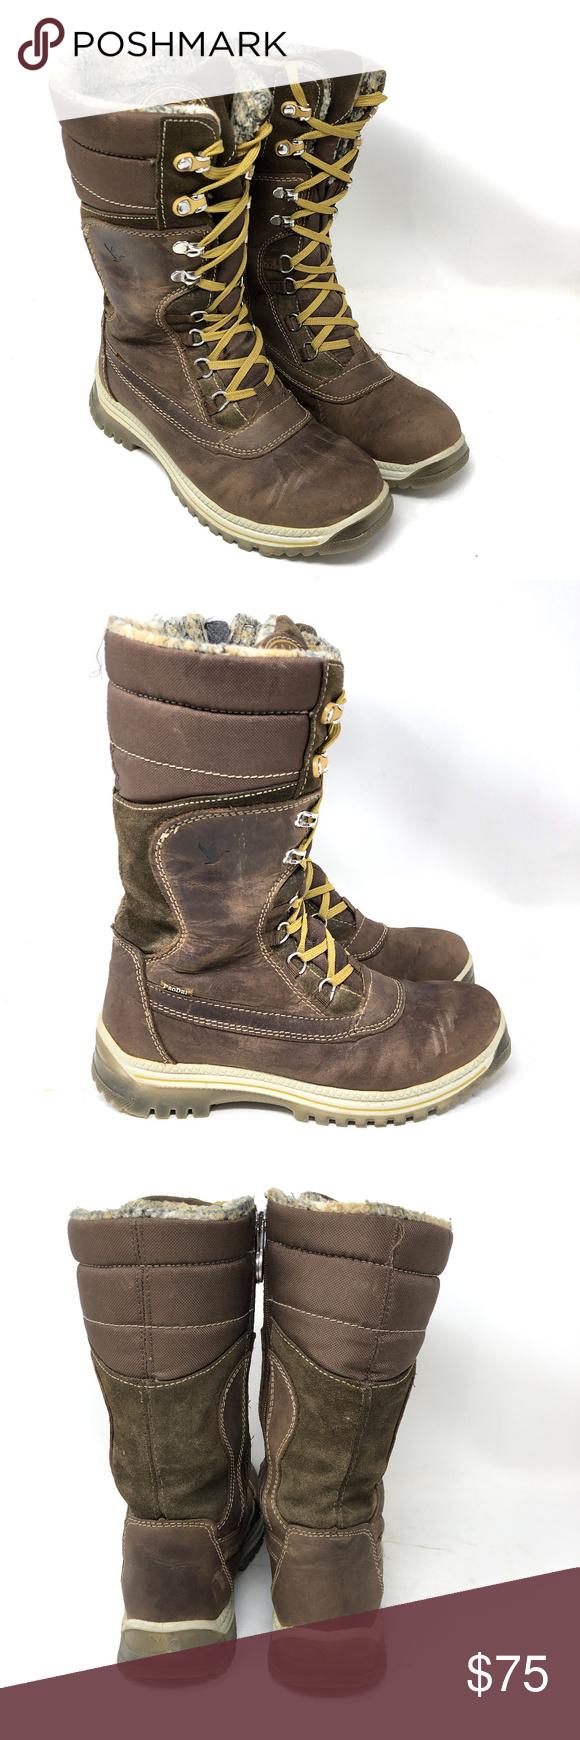 3740ef1e2d7 Santana Canada Waterproof Modena Boots Faux Fur